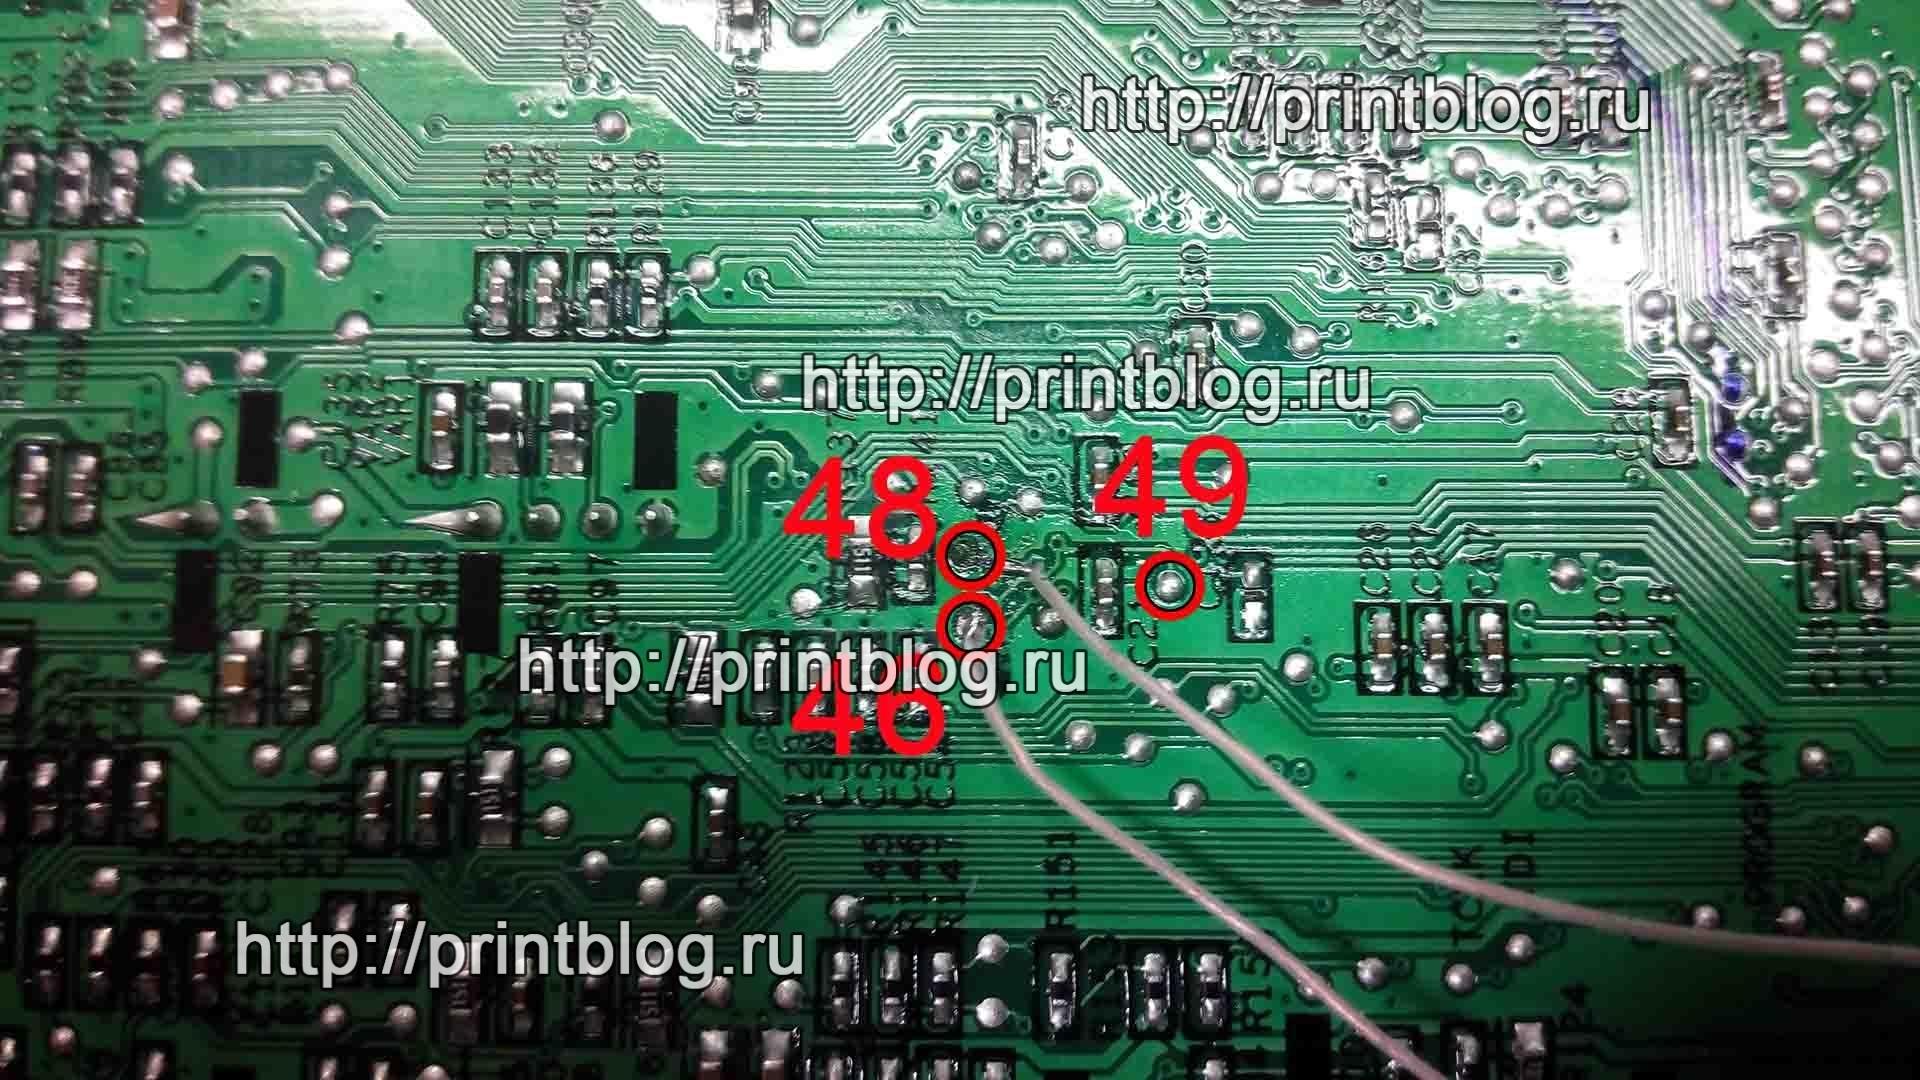 Схема подключения к процессору Jupiter4E Xerox 3155, Samsung ML-2525, ML-2520, ML-1910_1